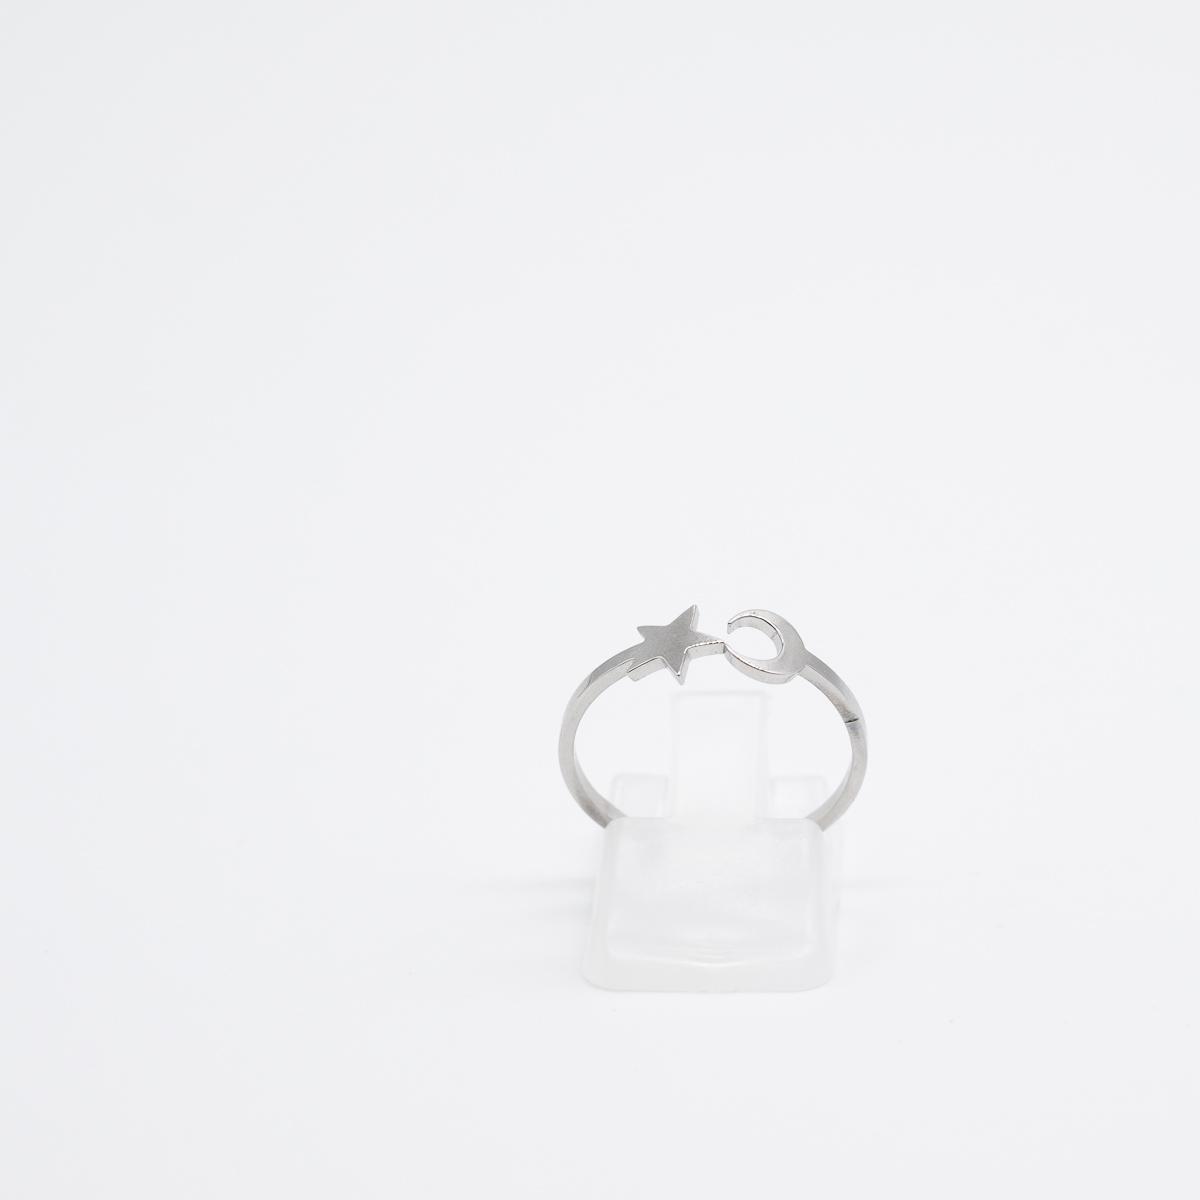 RNG-007 ring kopen boho maan ster zilver roestvrij staal